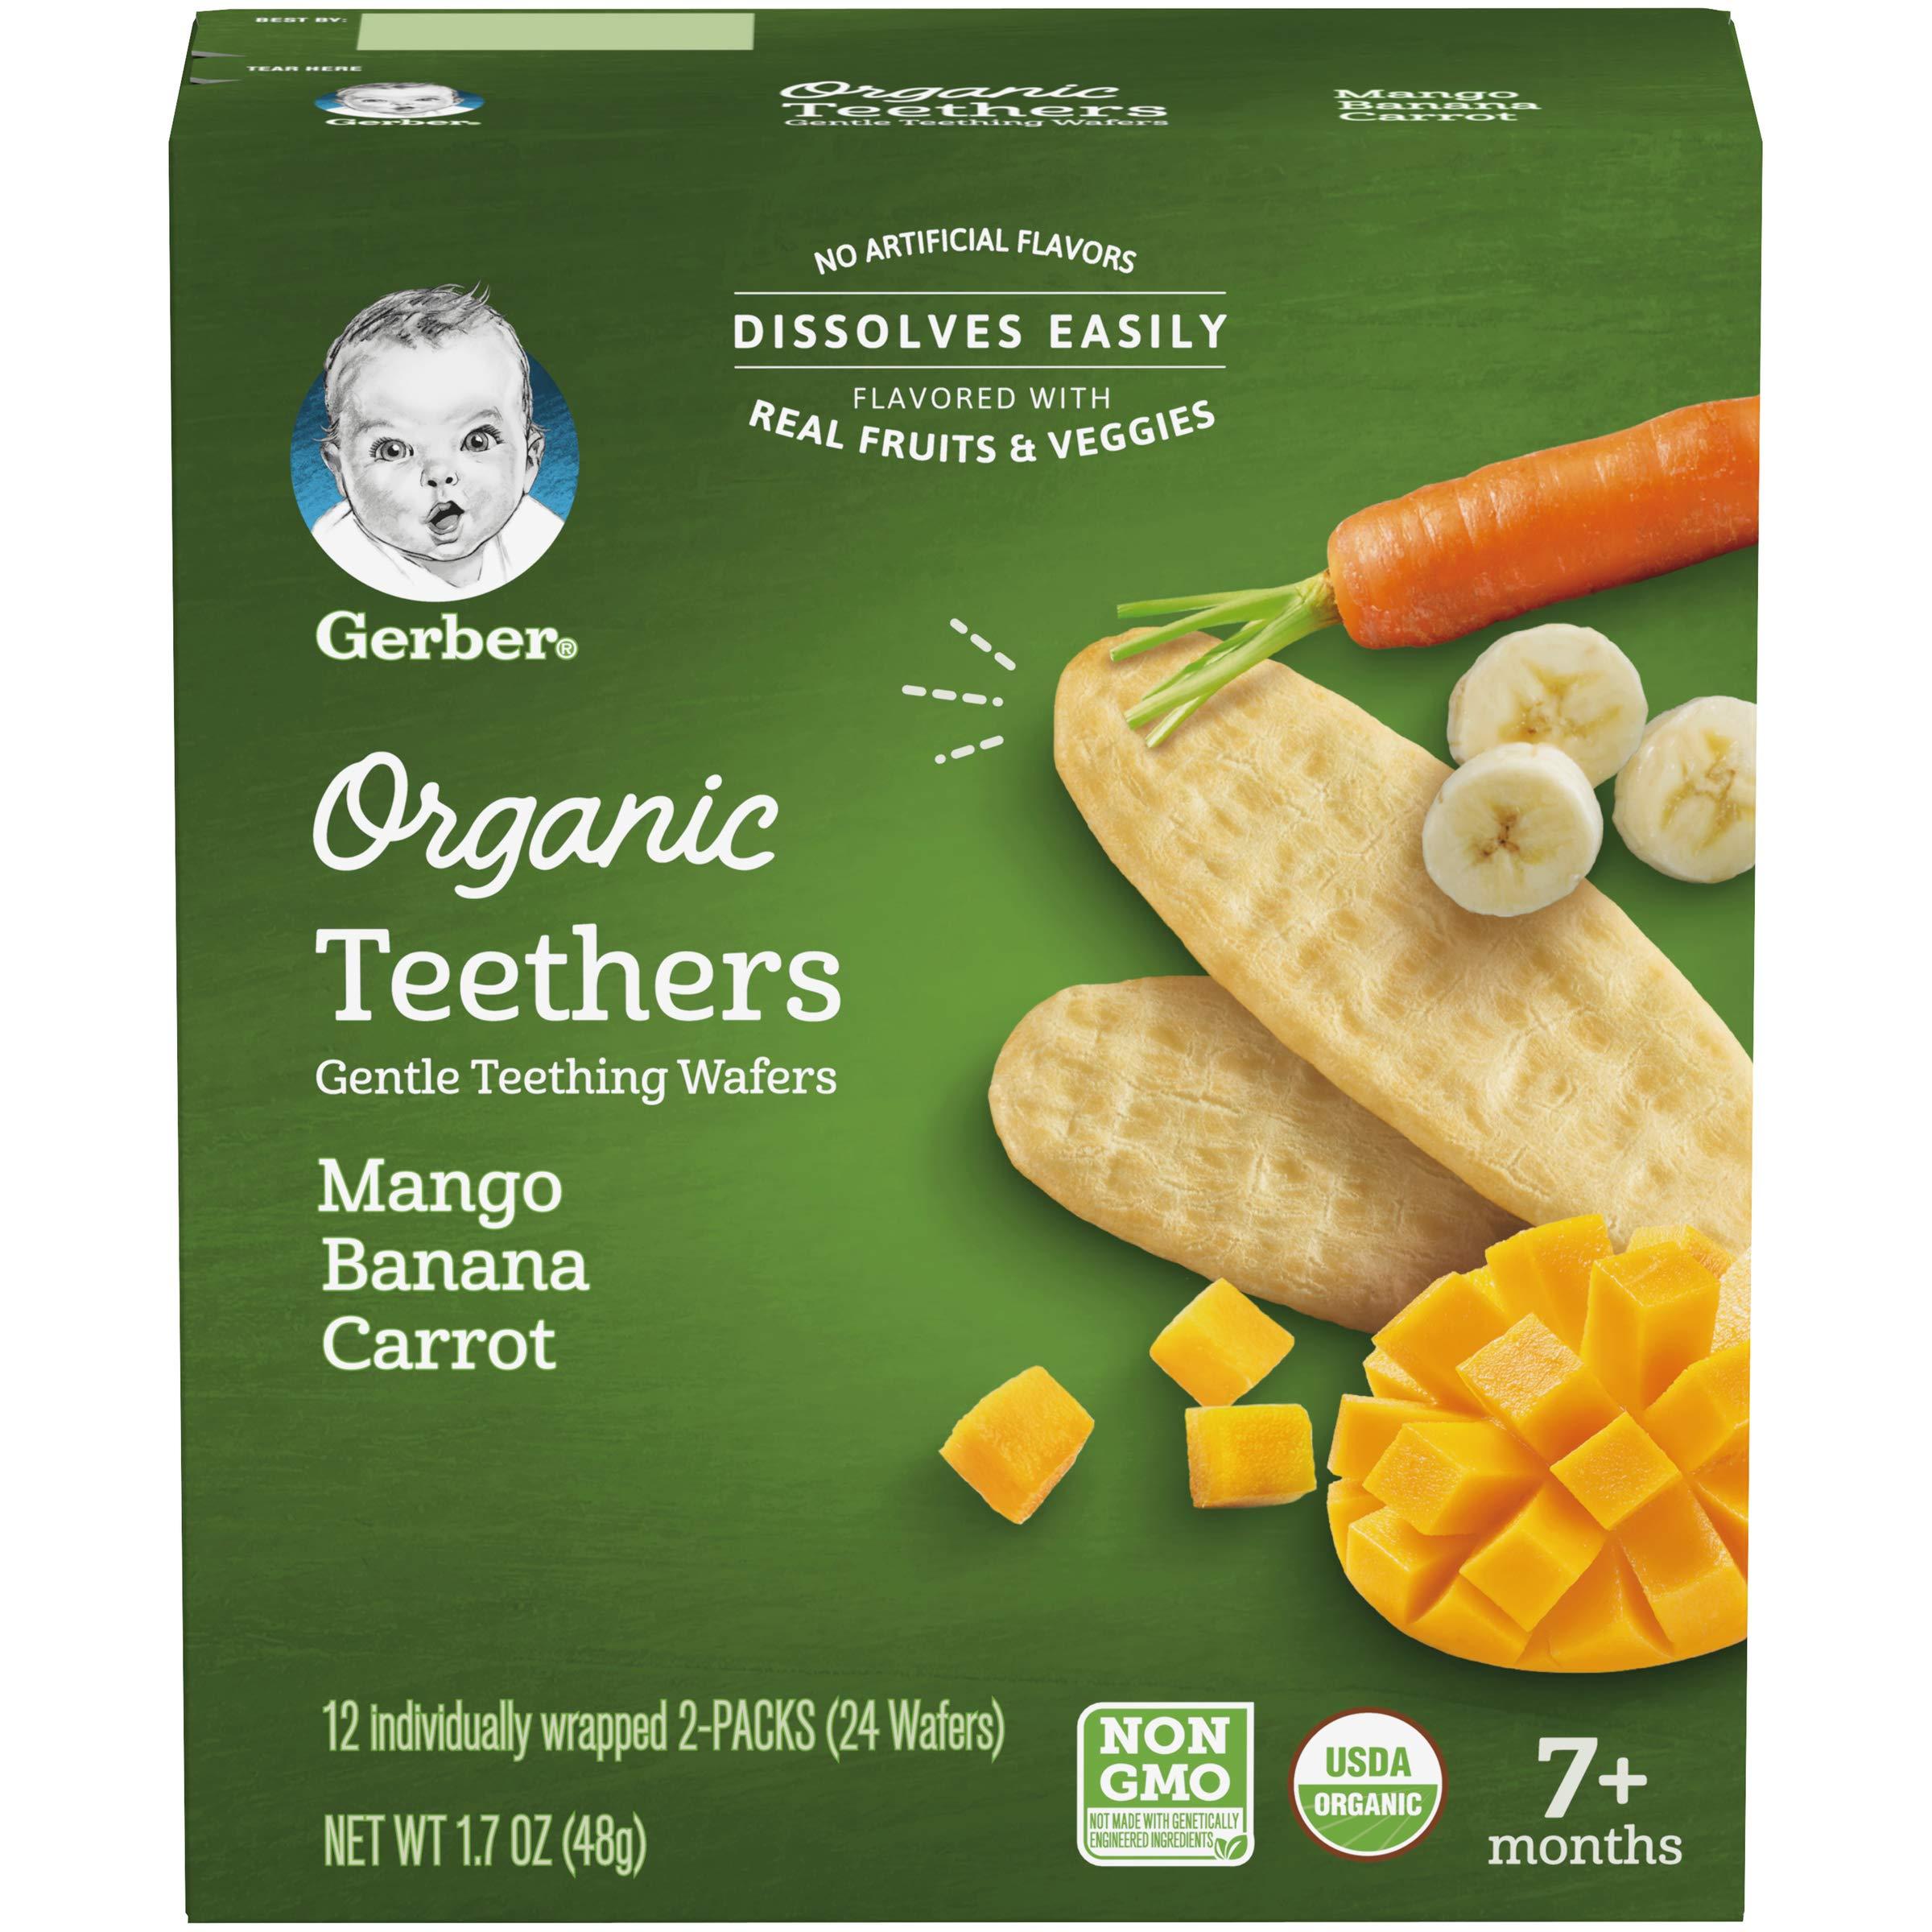 Gerber Organic Teethers, Mango Banana Carrot, 1.7 oz, 12 count Box (Pack of 6)